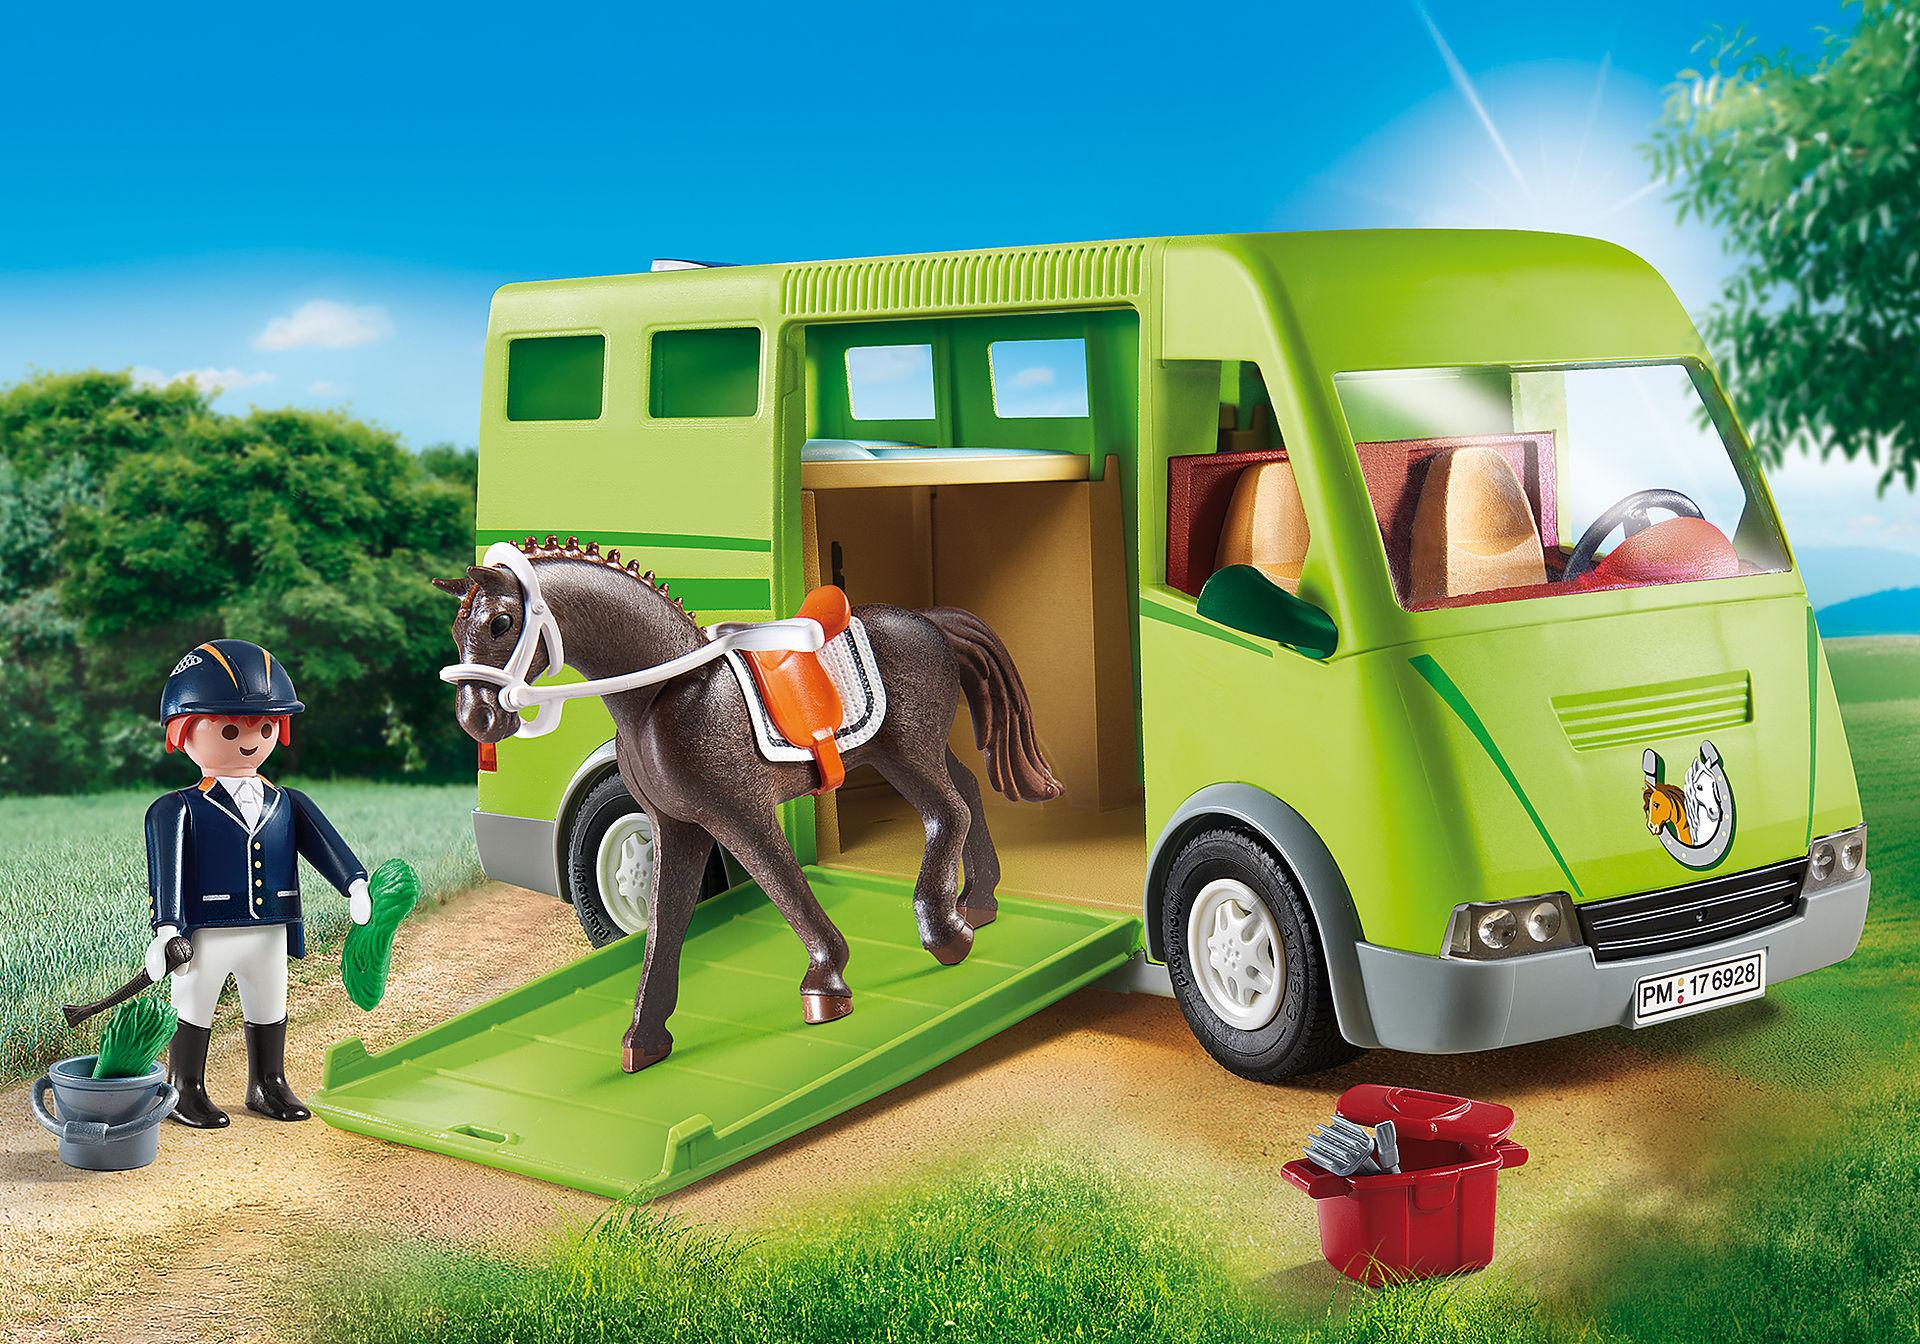 http://media.playmobil.com/i/playmobil/6928_product_detail/Pferdetransporter